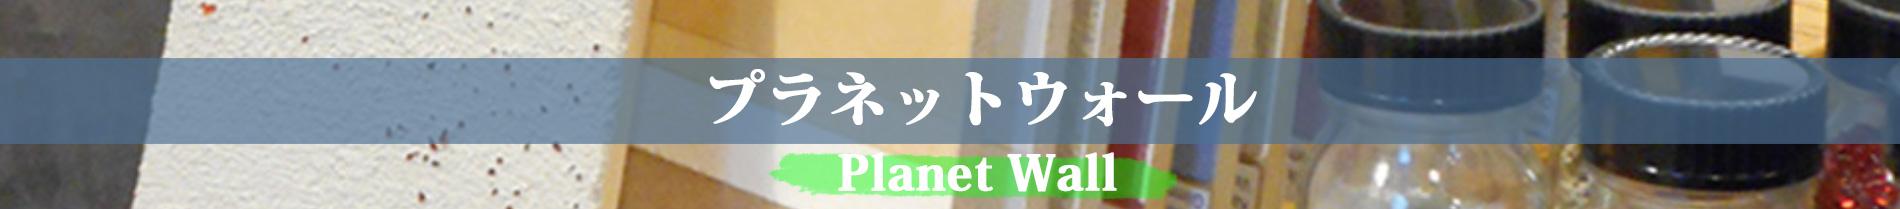 planetwall-main1